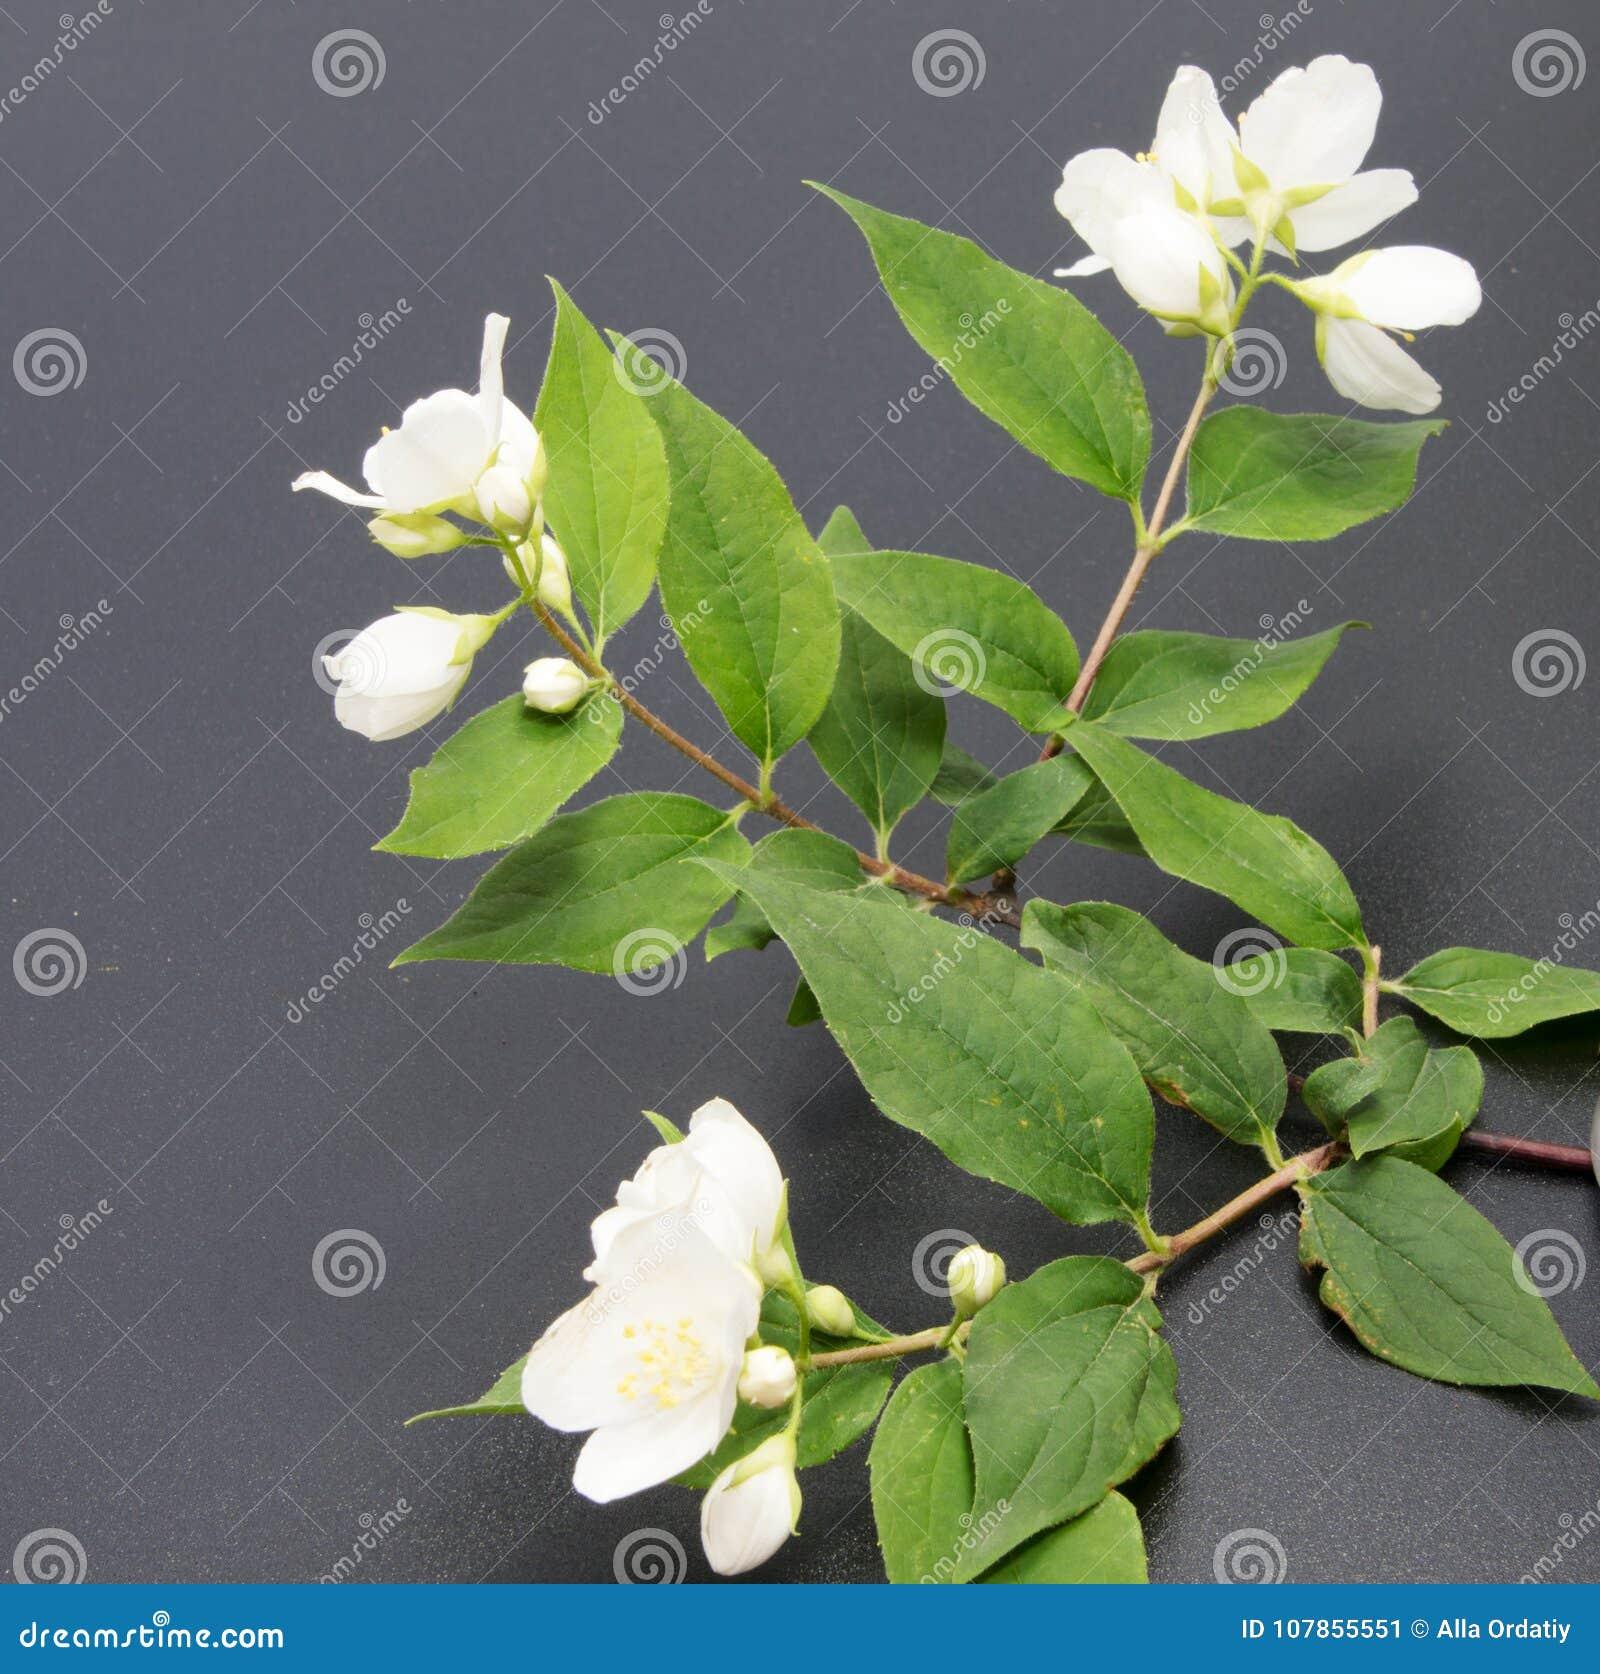 A Branch Of The Jasmine Flower Isolated White Jasmine Flower Stock